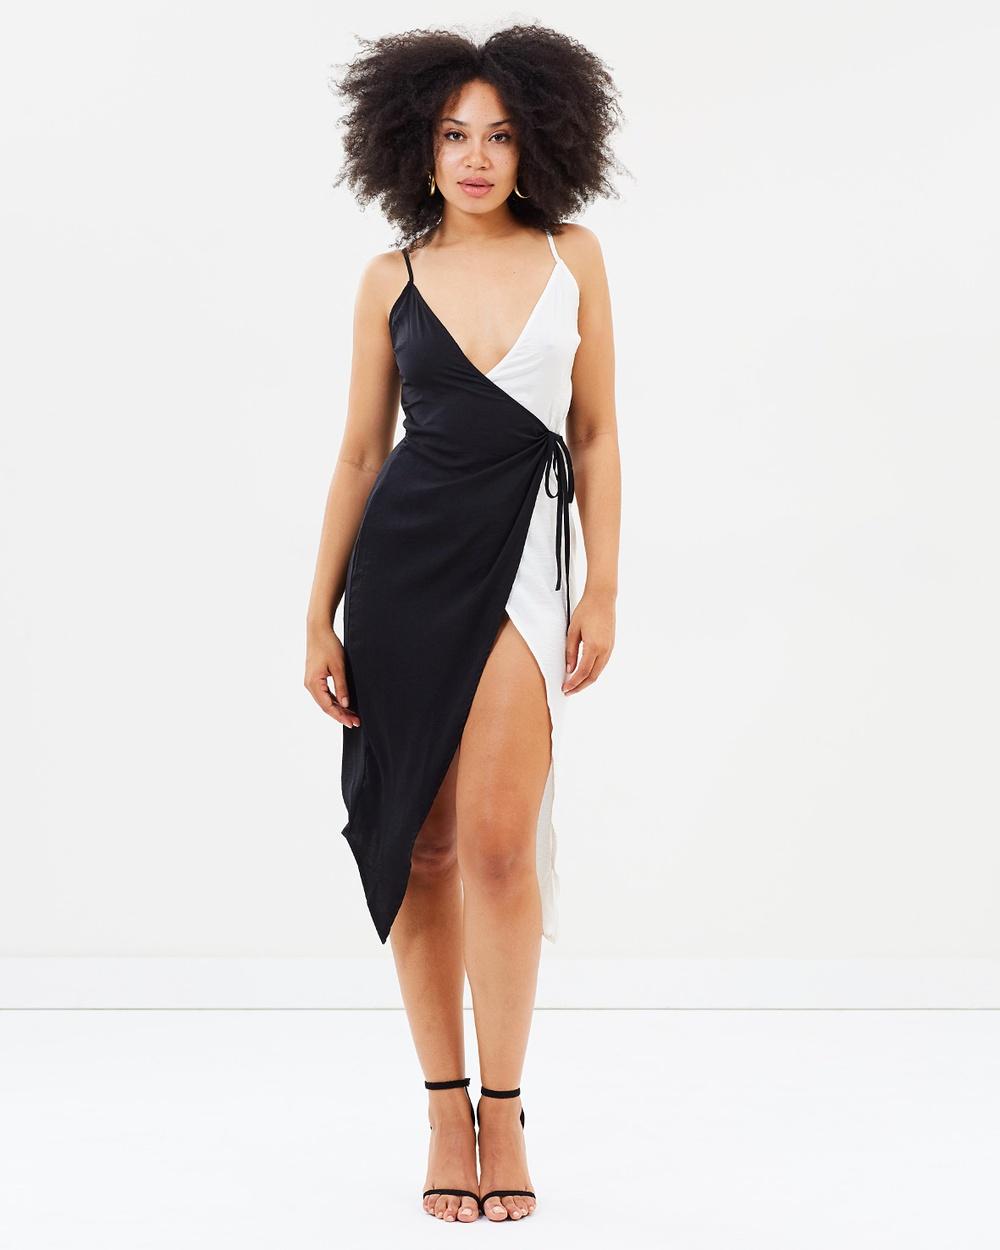 Missguided Monochrome Satin Wrap Dress Dresses Black Monochrome Satin Wrap Dress